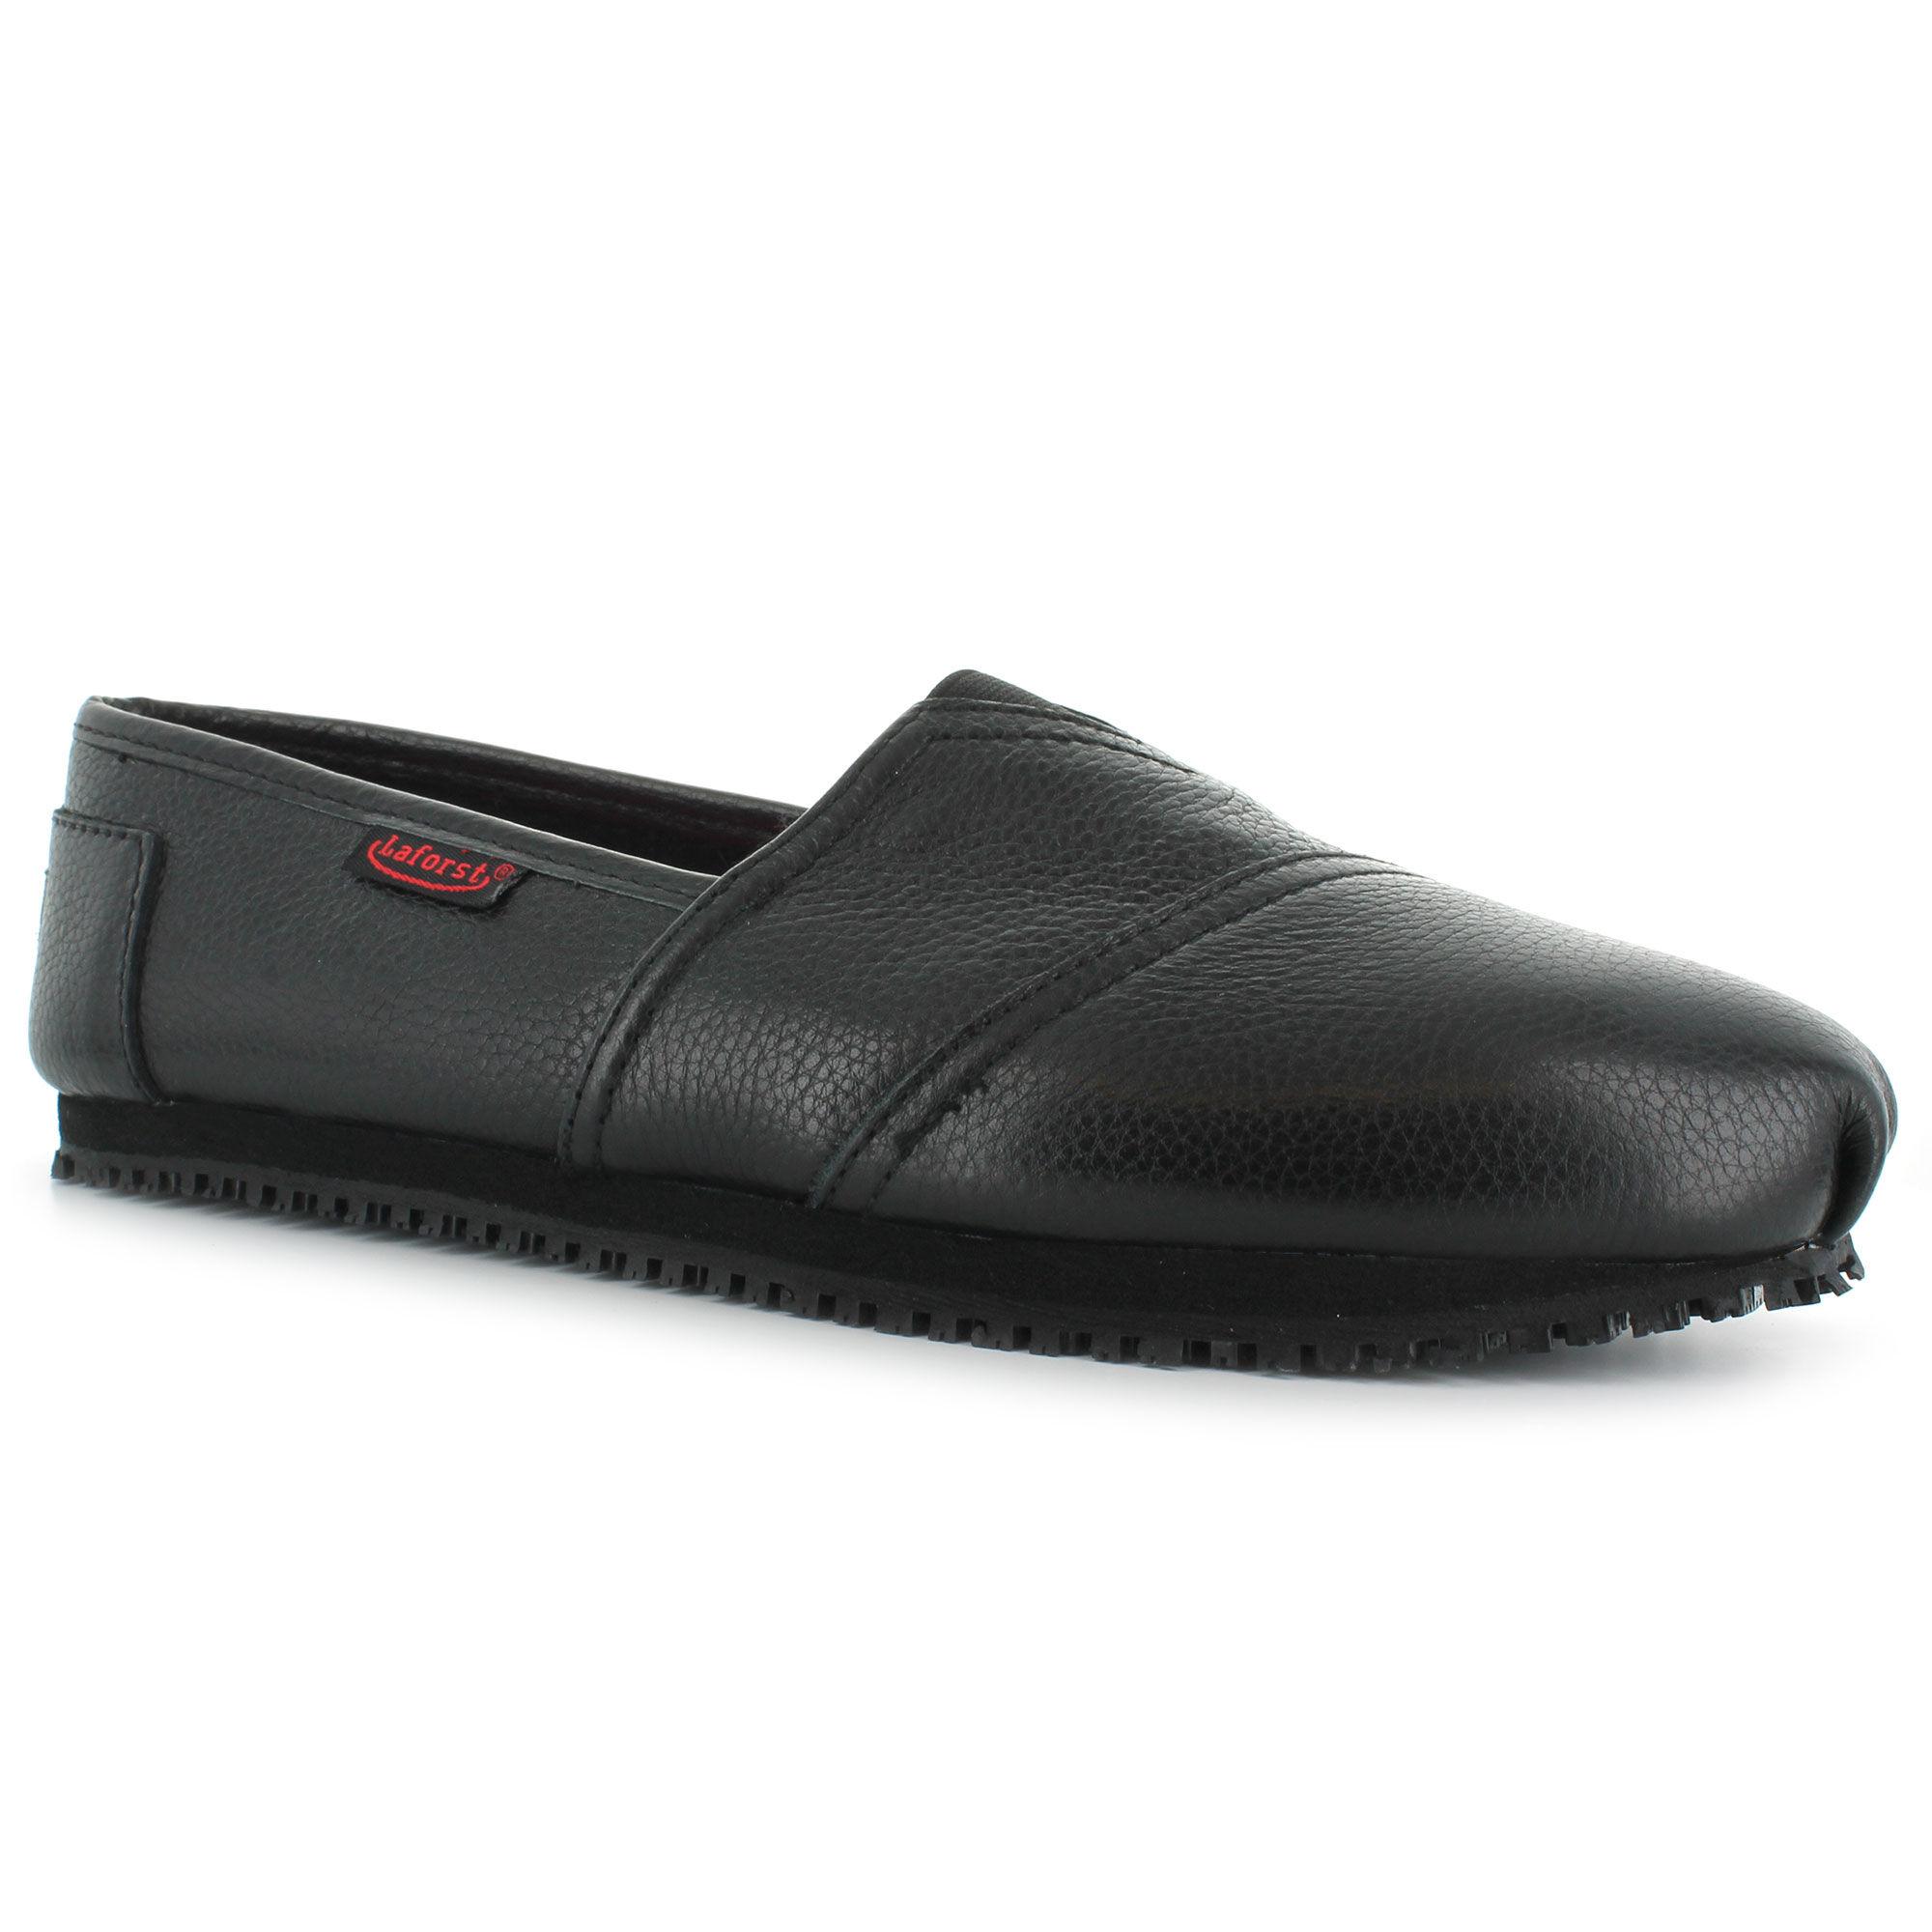 Women's Slip-Resistant Work Shoes